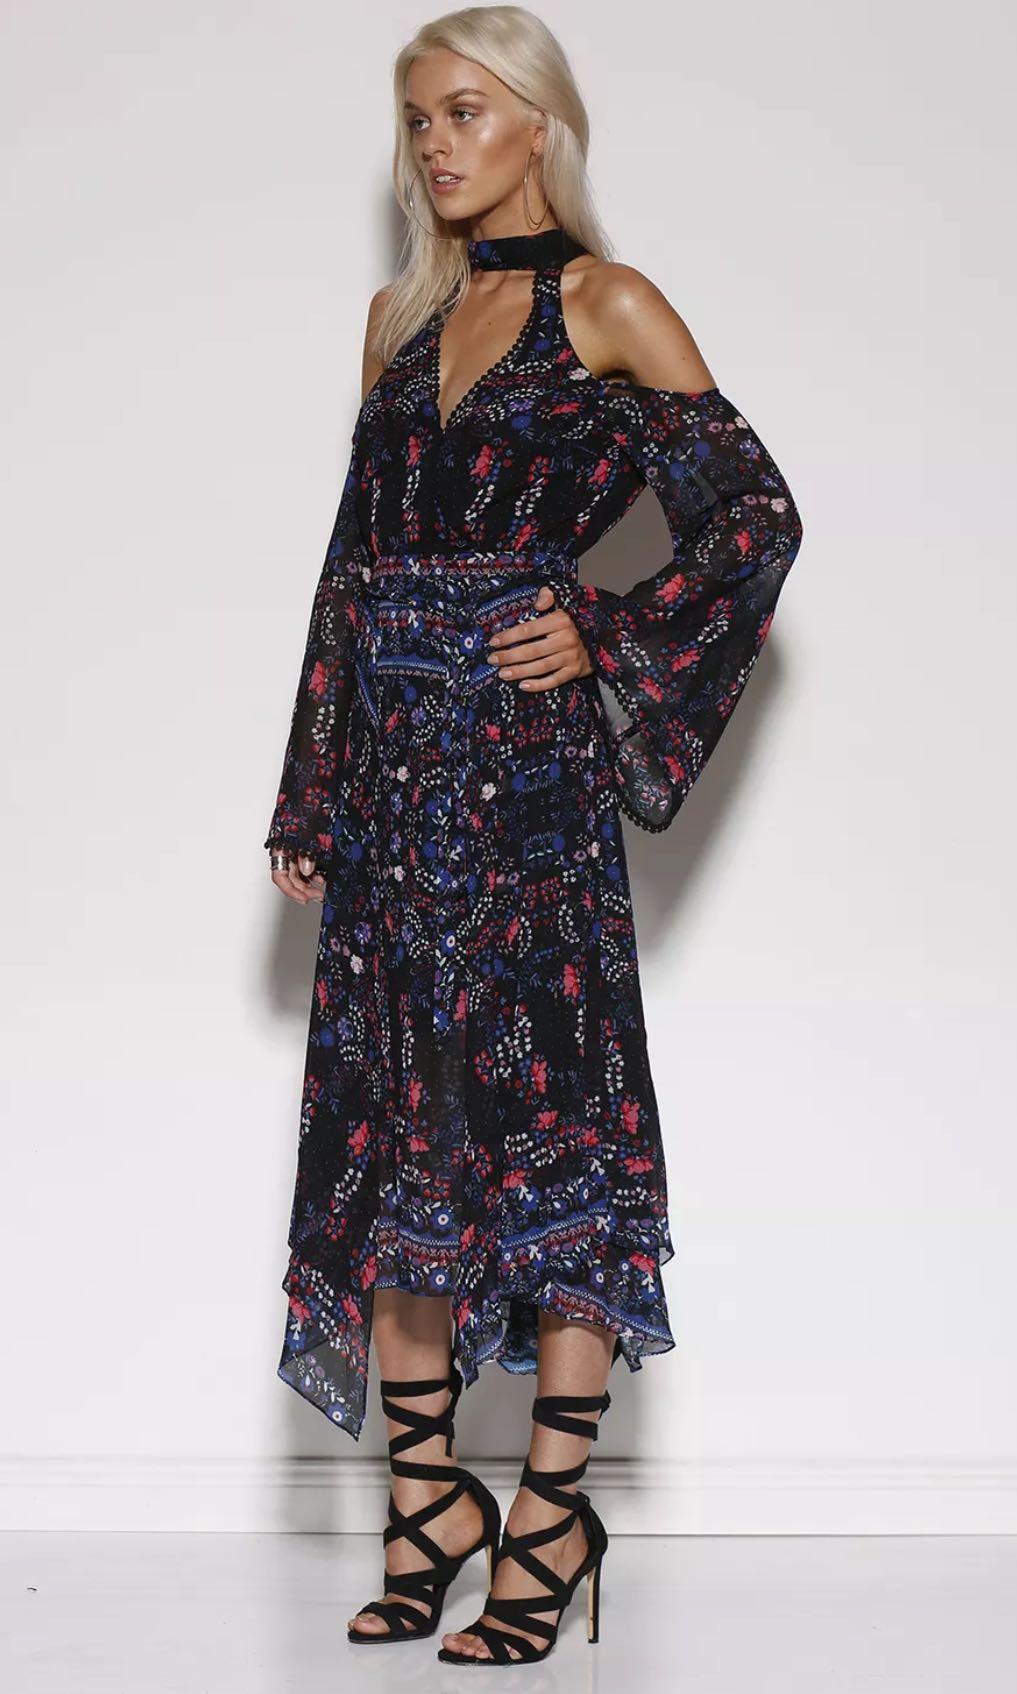 Ministry of Style Midi Olysea Dress 12 BNWT RRP$229